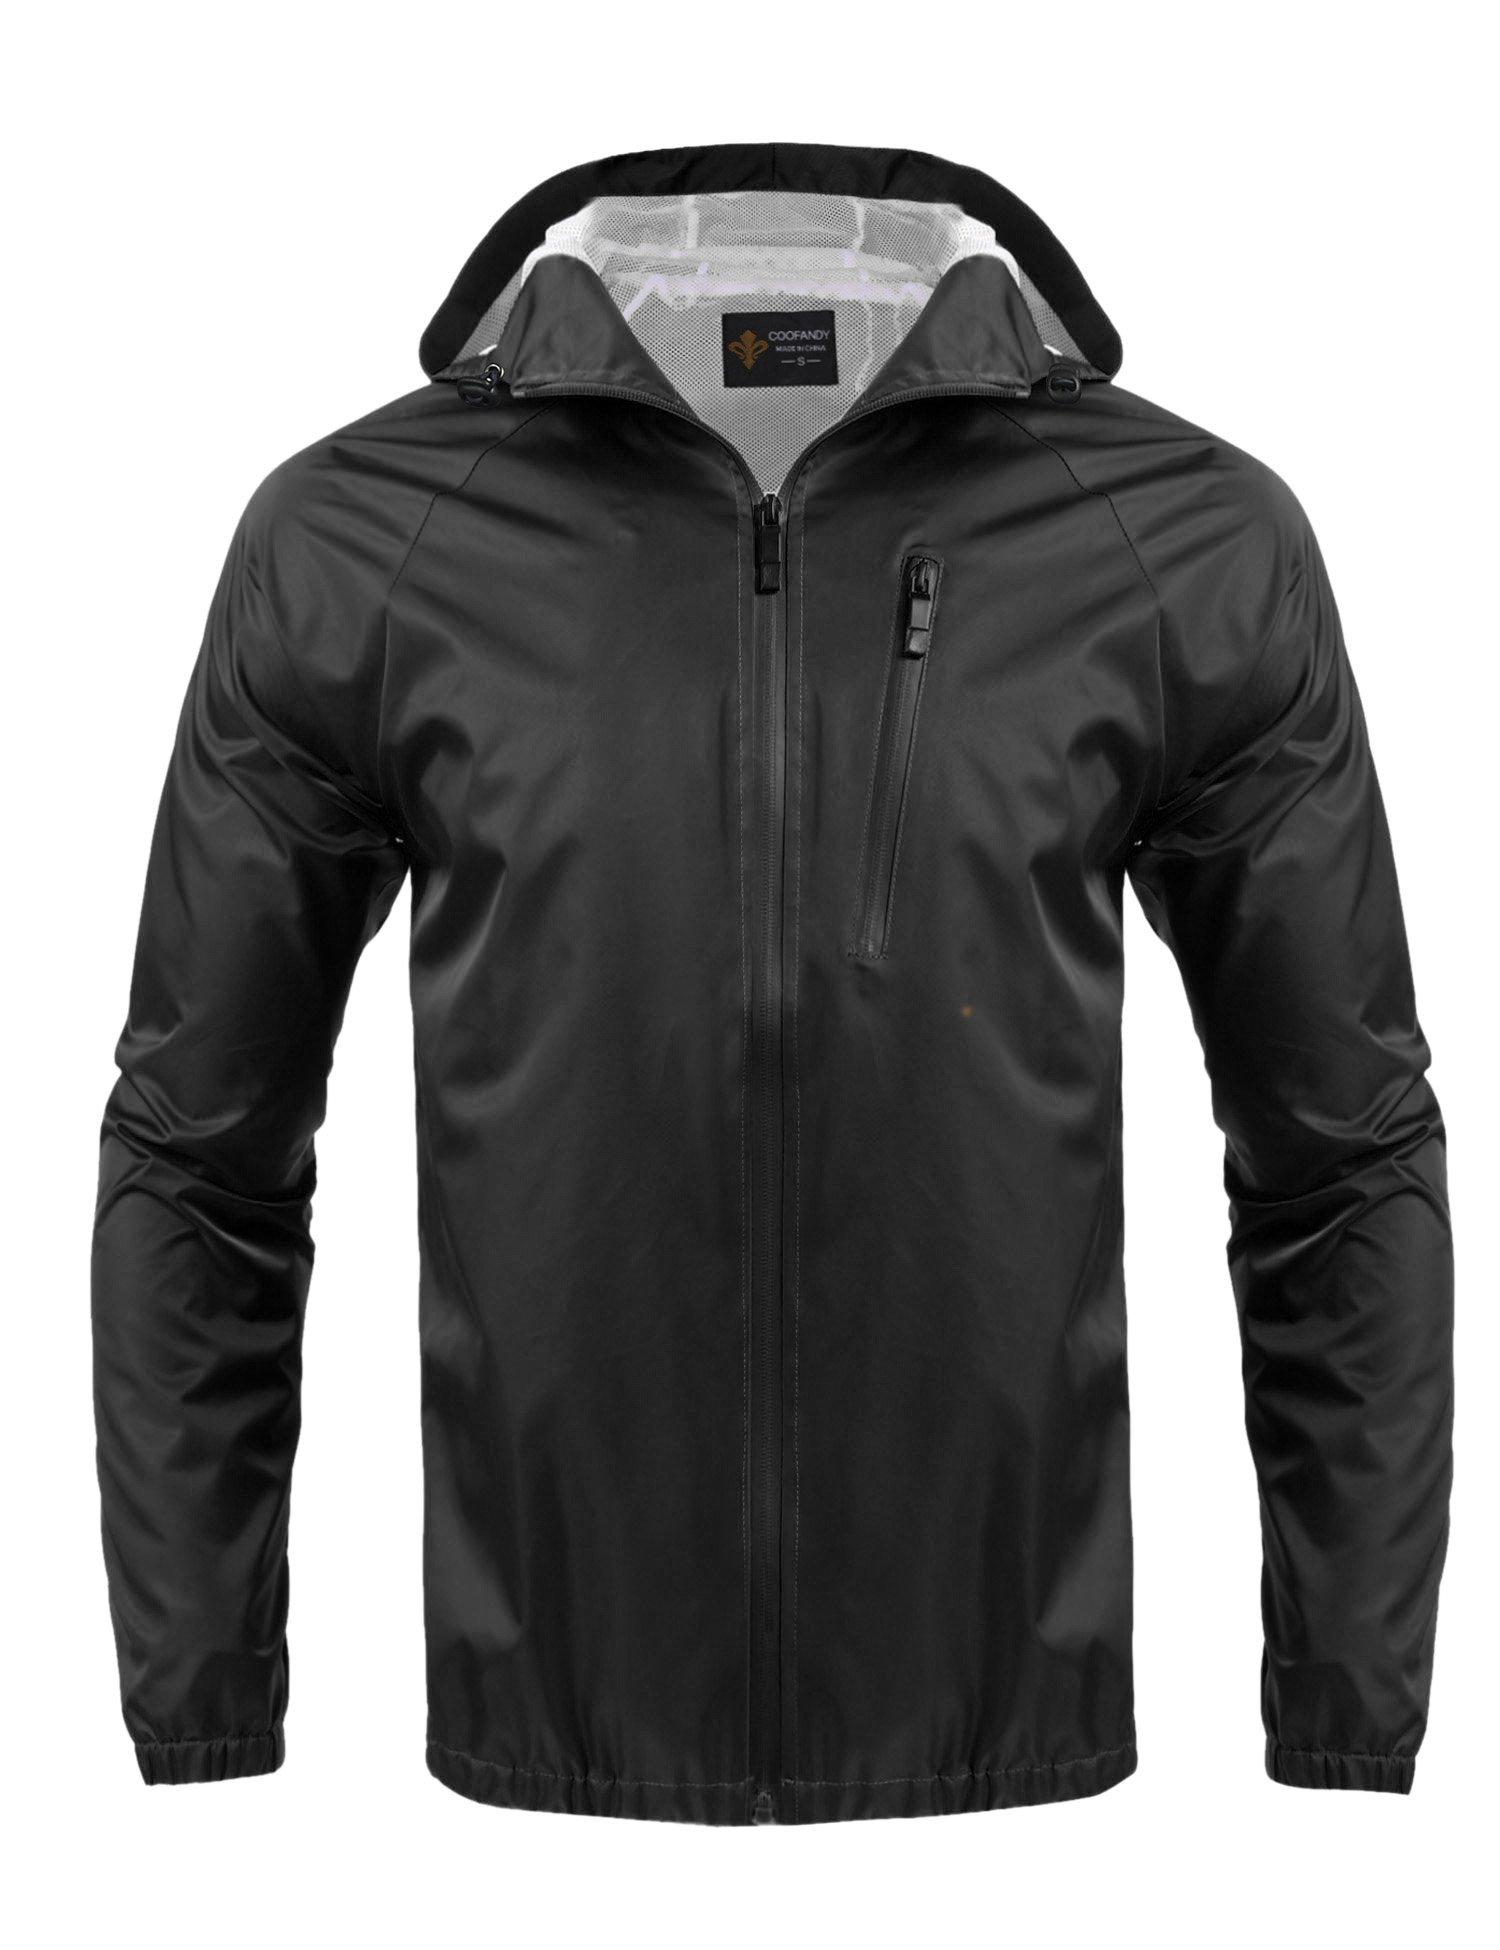 Jinidu Unisex Lightweight Hooded Running Cycling Rain Jacket Outdoor Raincoat (Small, Black2) by Jinidu